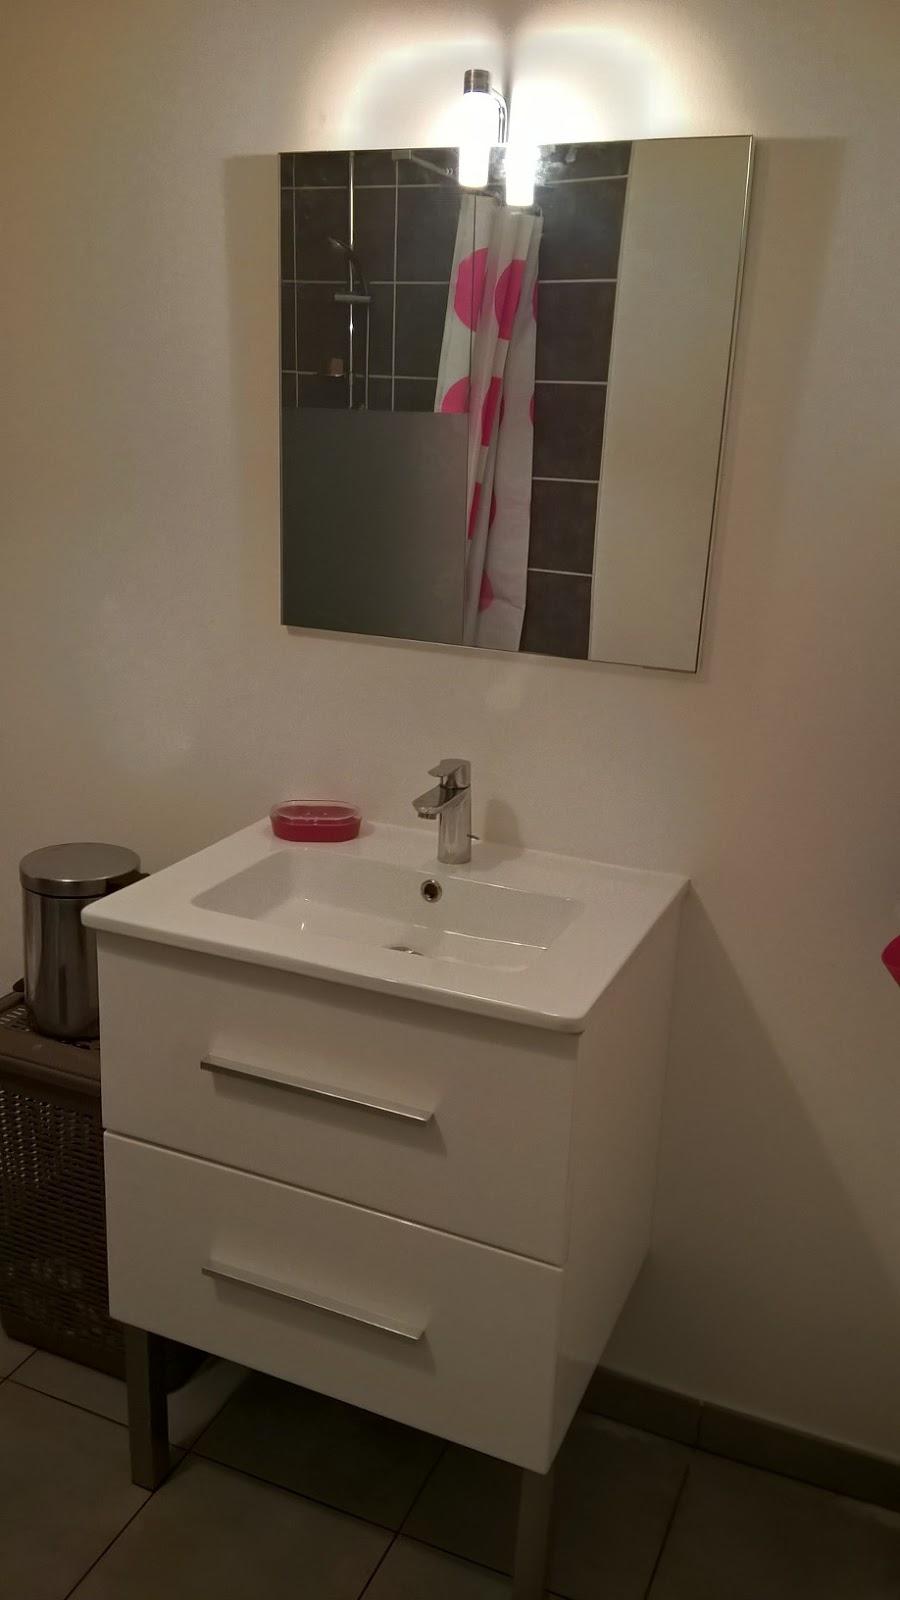 meuble lavabo ancien commode photos vivastreet lavabo ancien coiffeuse meuble de toilette. Black Bedroom Furniture Sets. Home Design Ideas